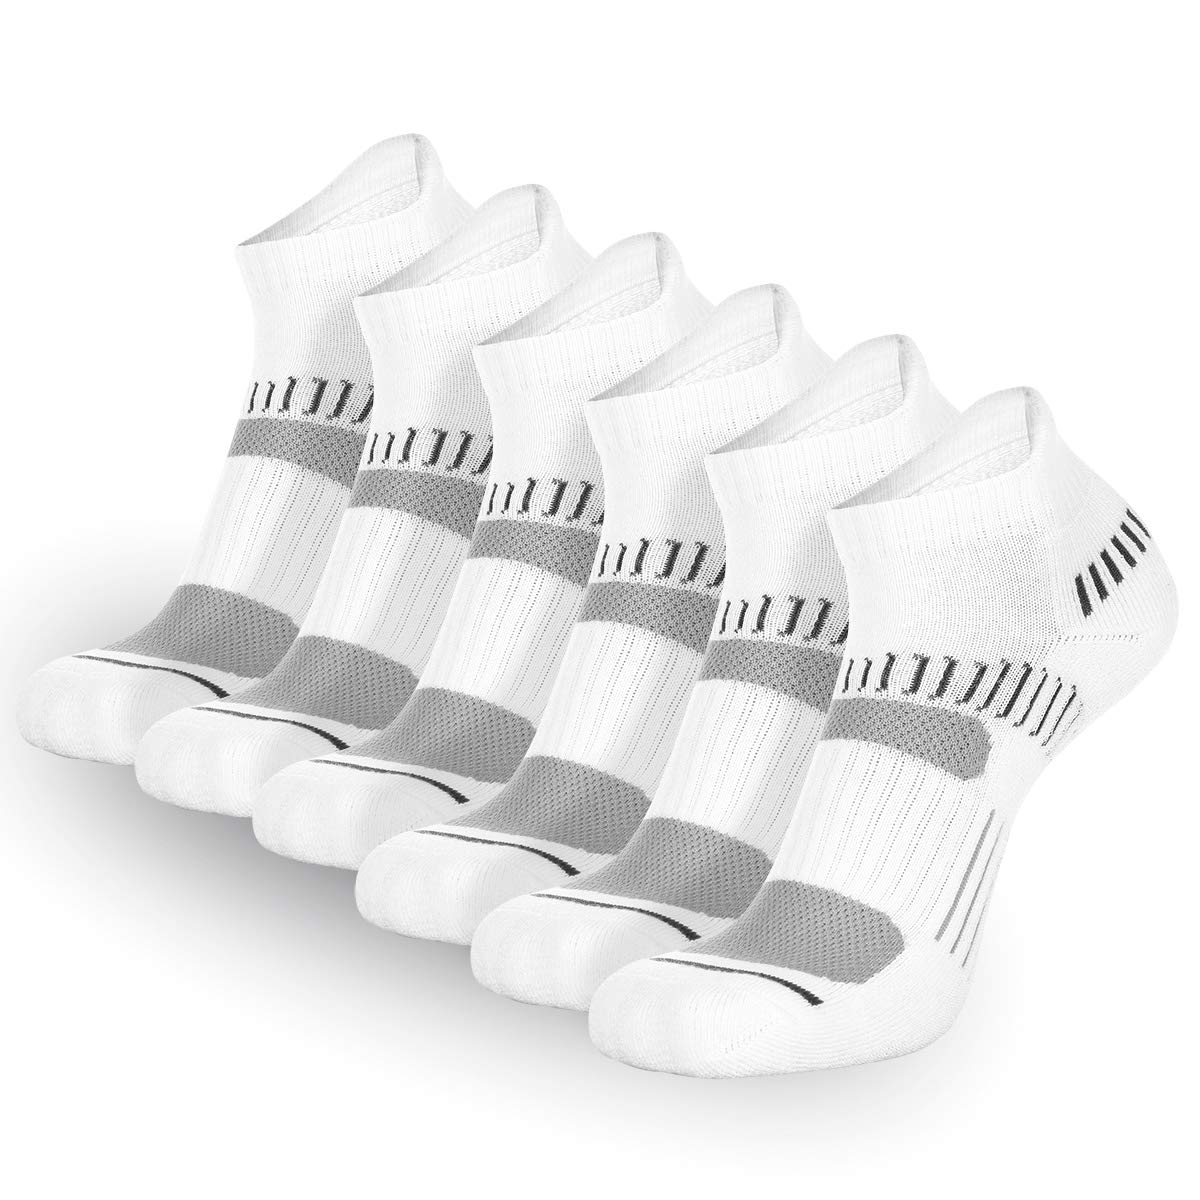 FLYRUN Womens Athletic Ankle Socks Women 6 Pack Performance Cushioned Low Cut Running Tab Socks